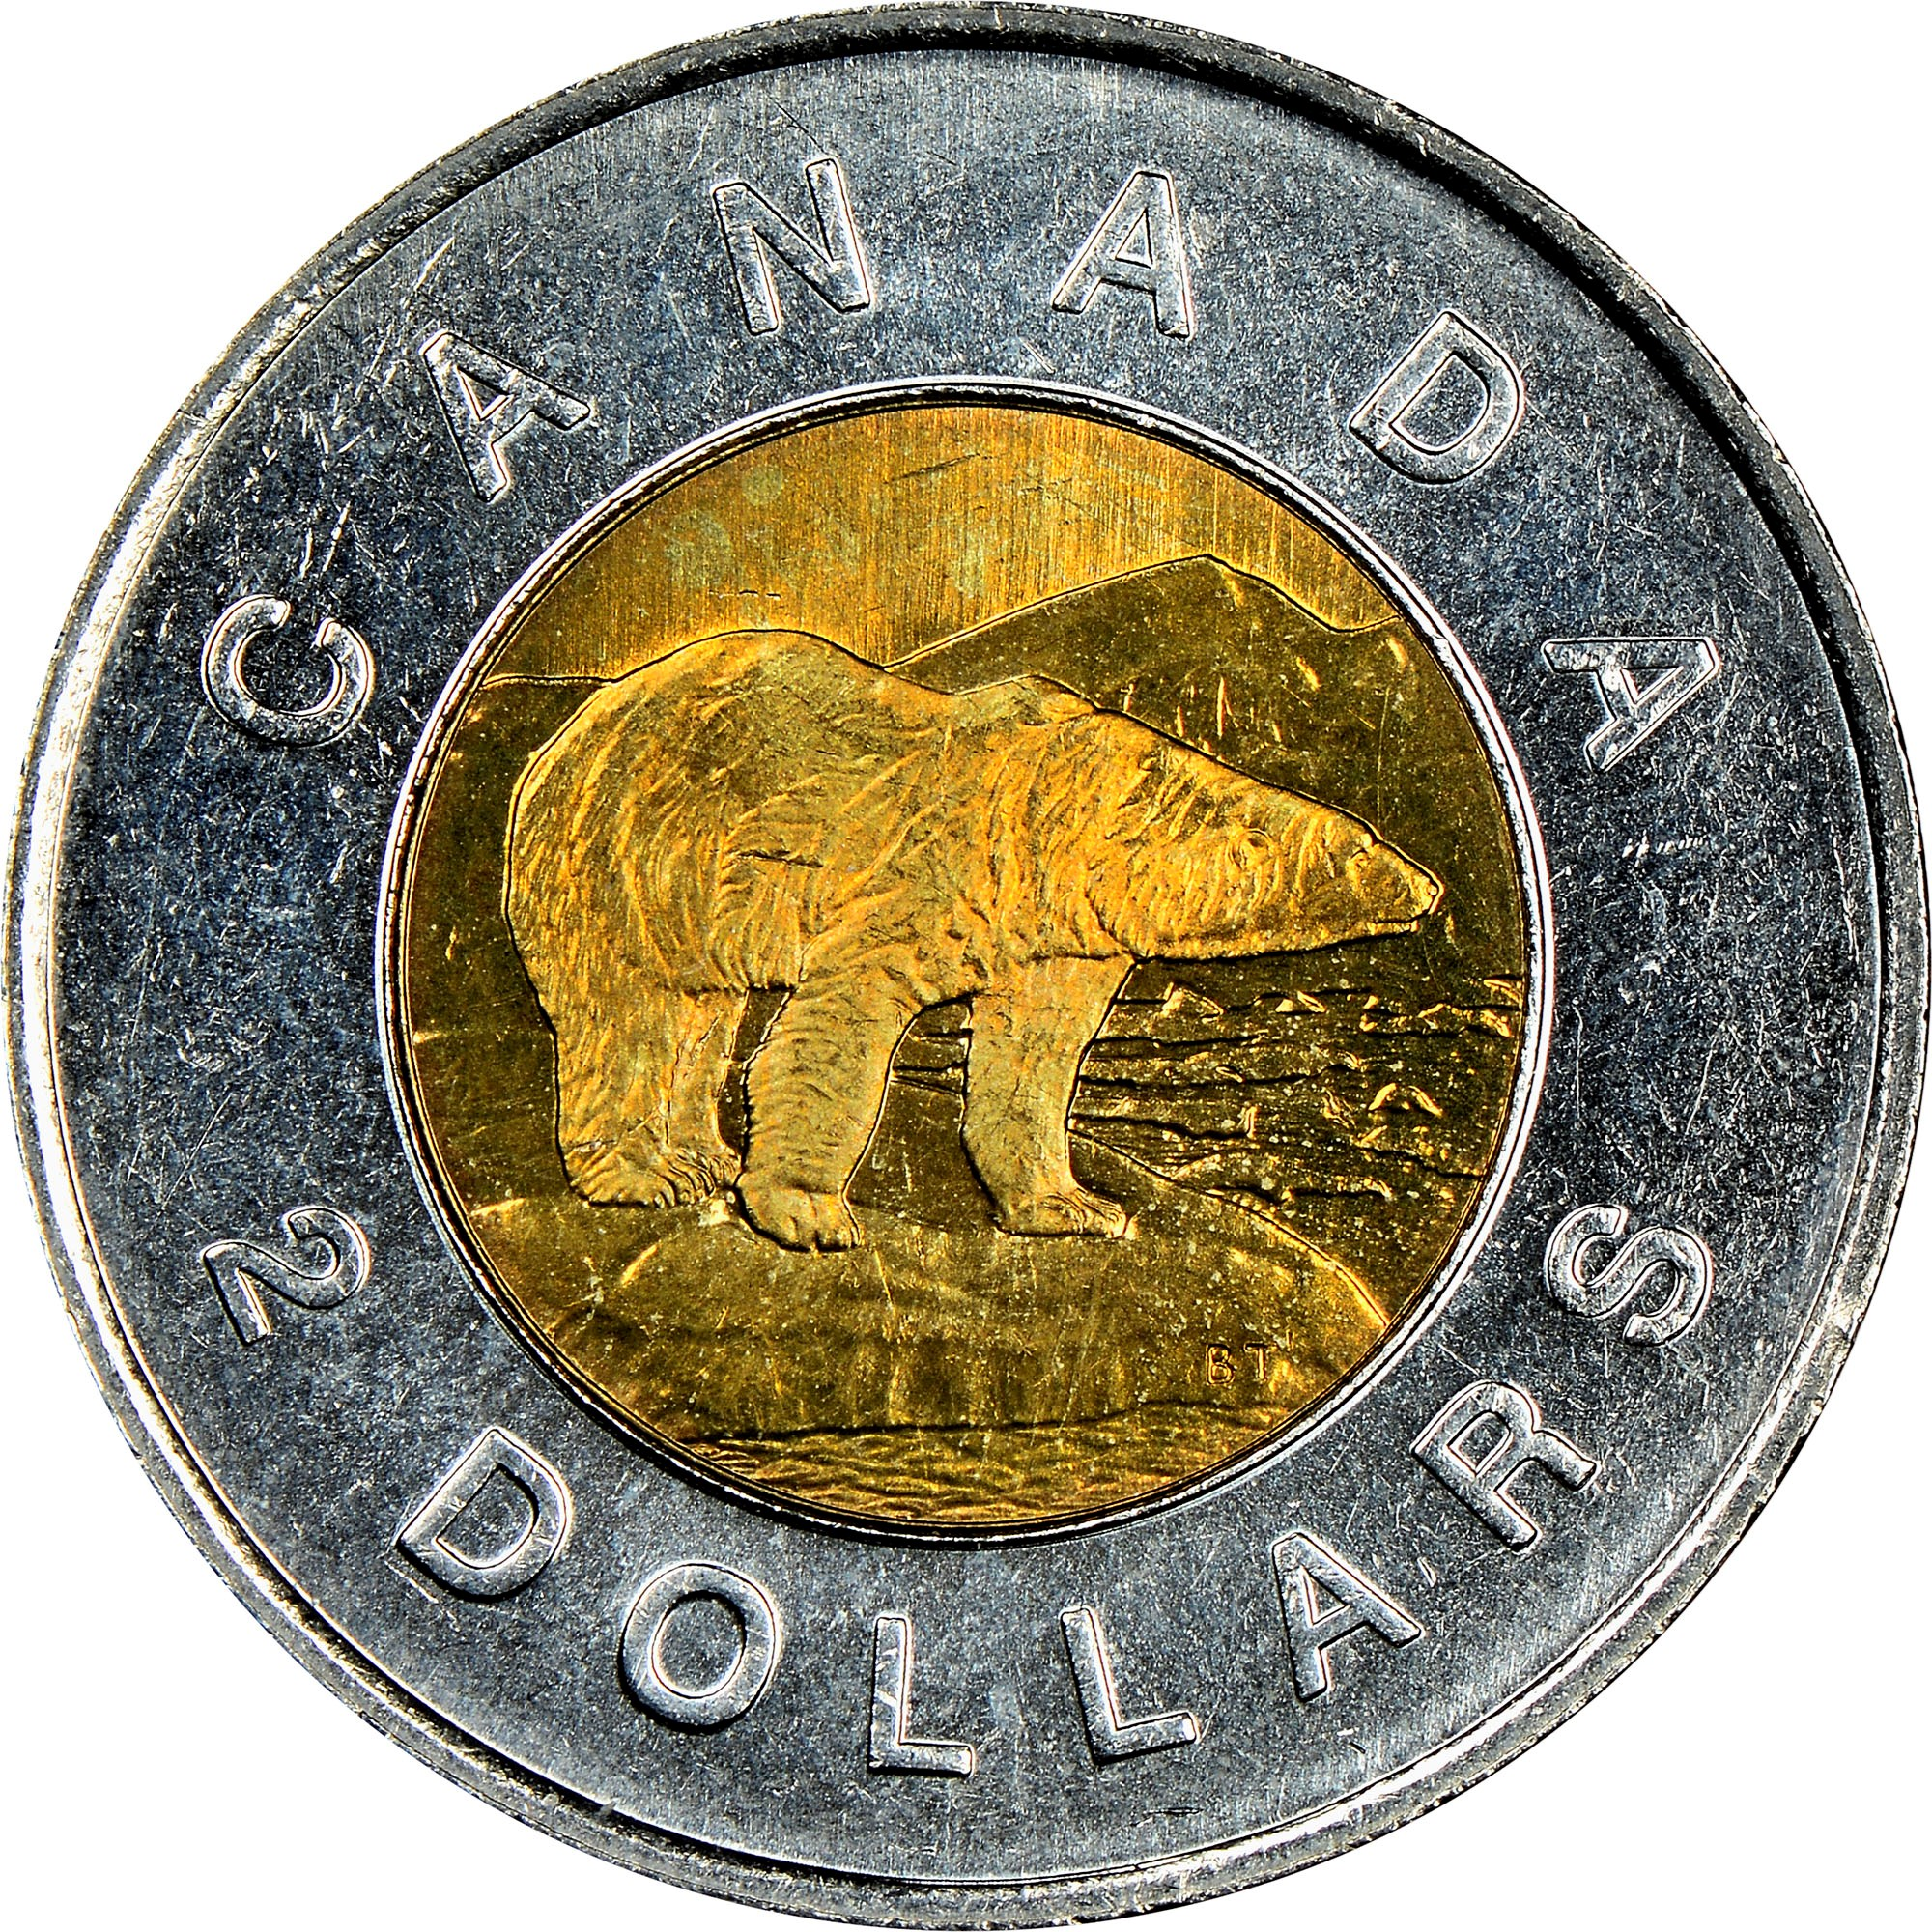 Canada 2 Dollars reverse